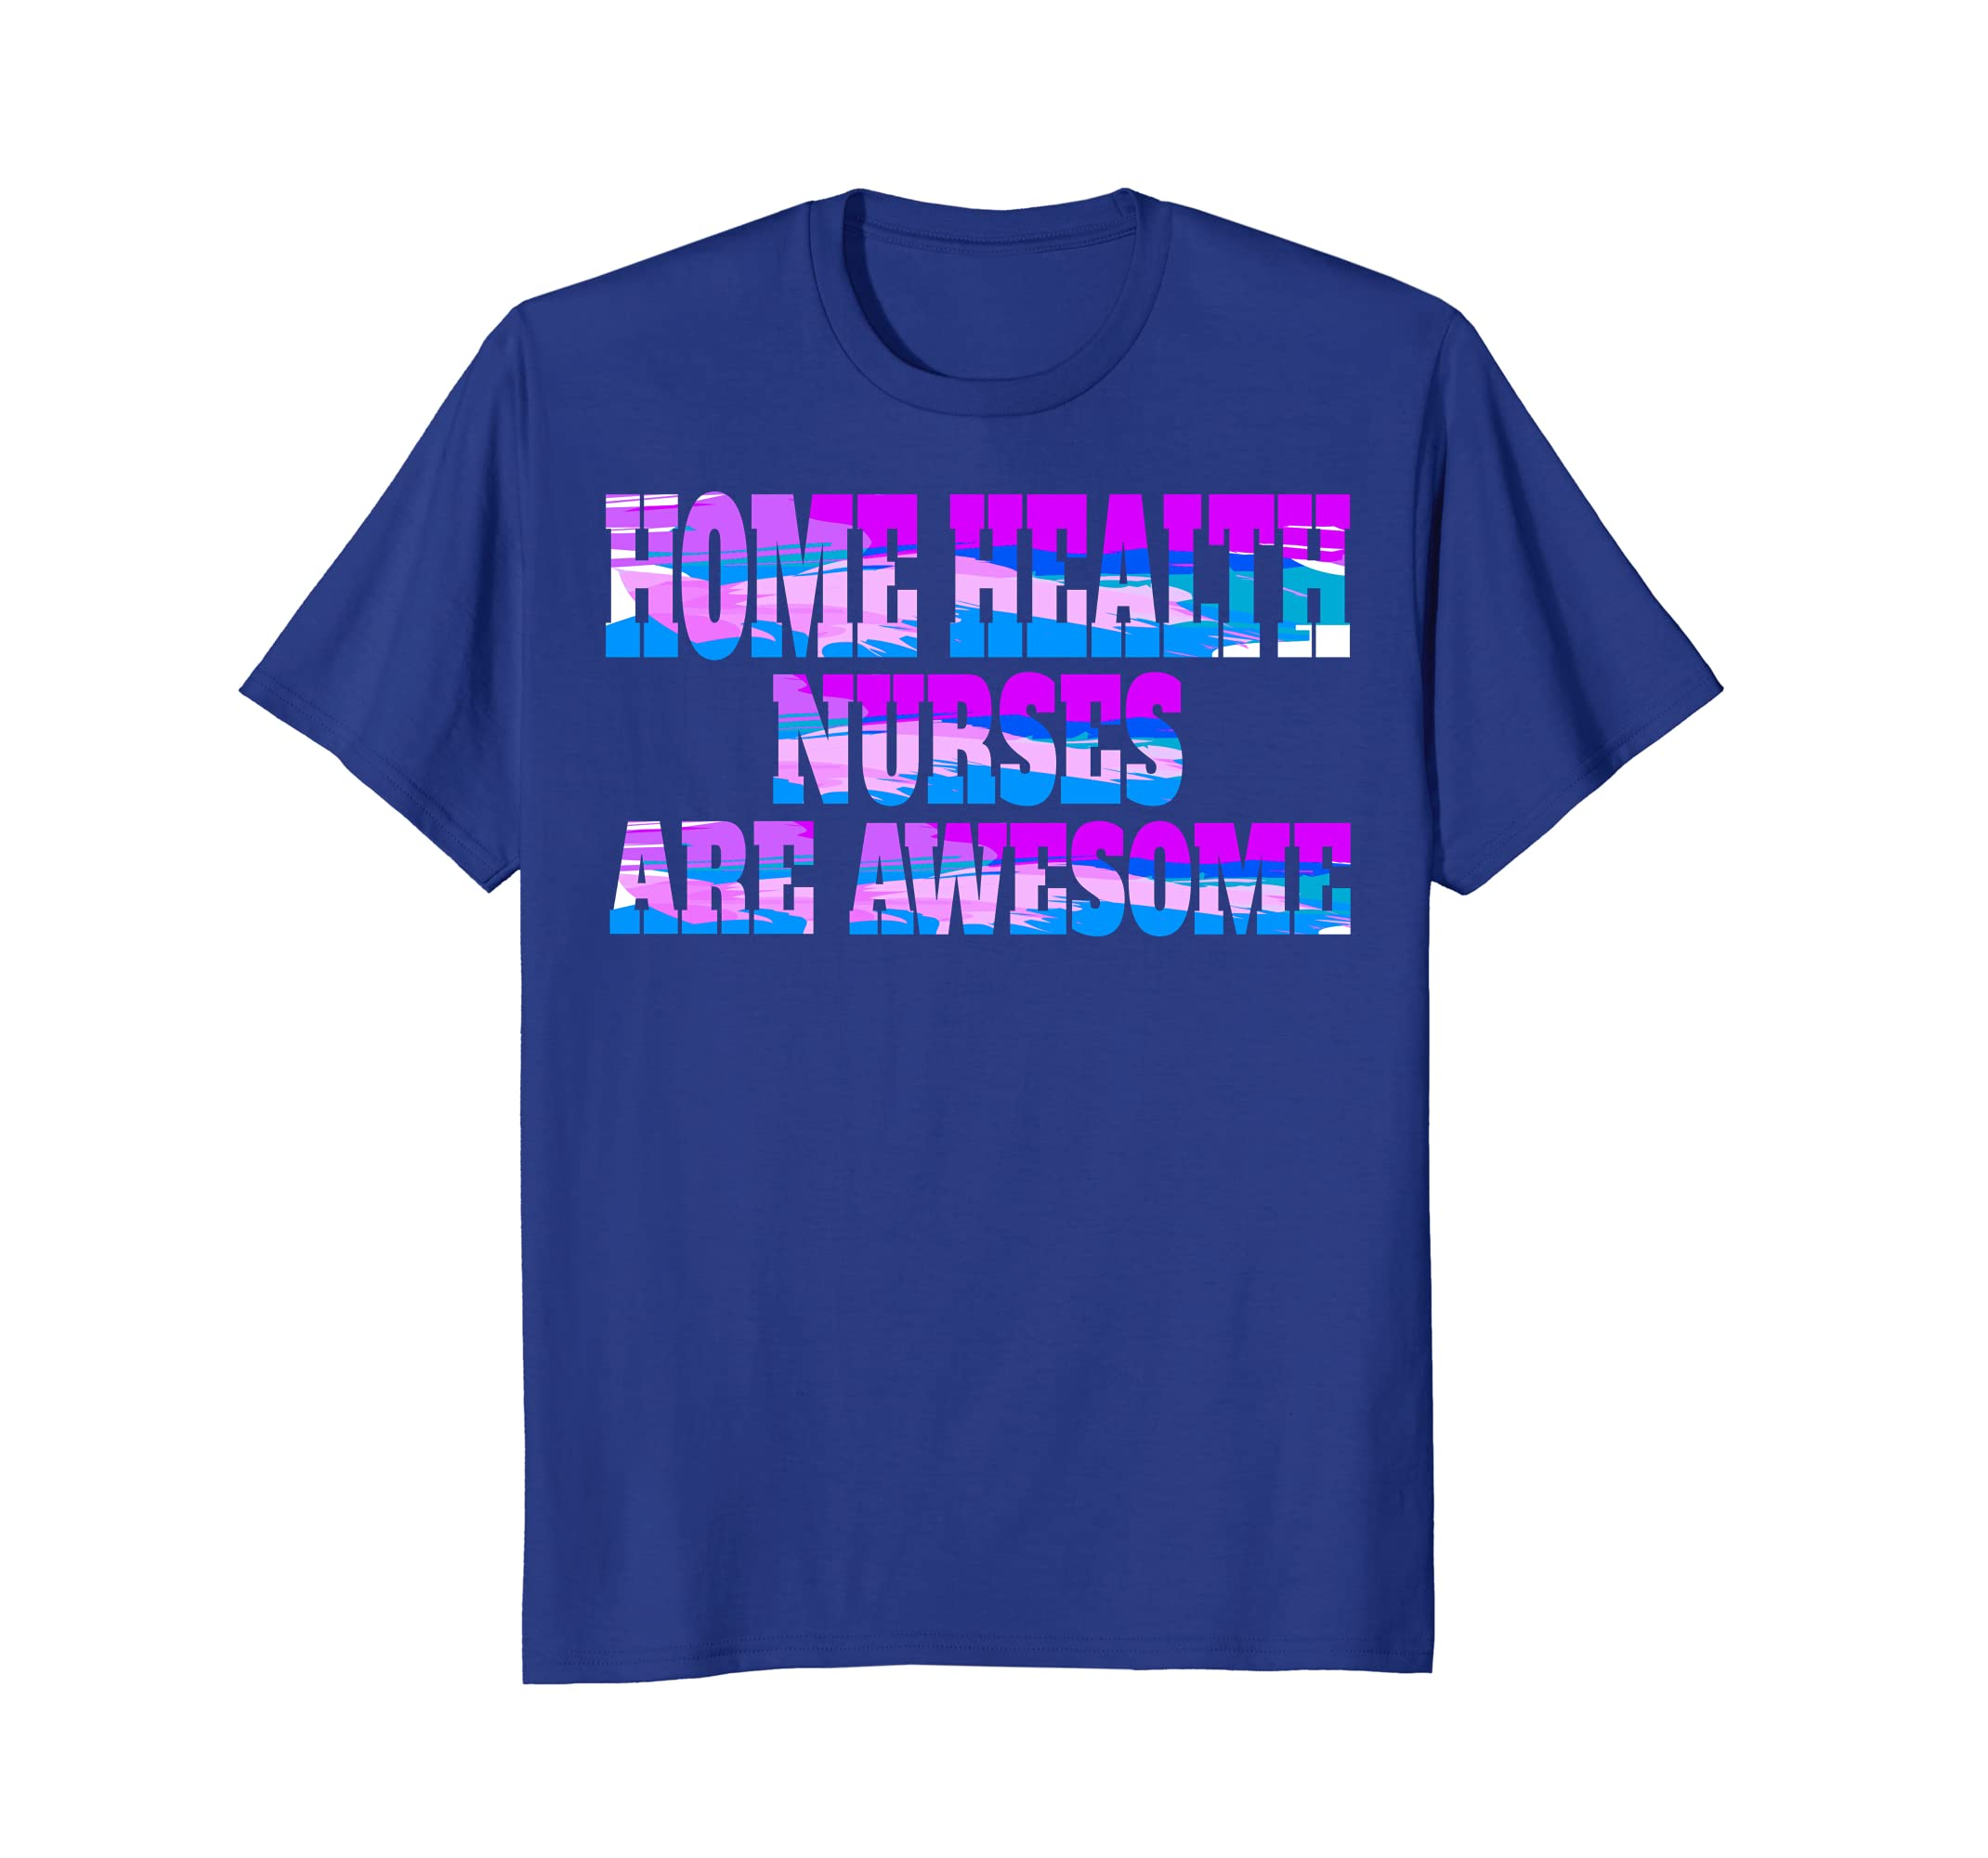 fb48d6ae7 Amazon.com: Funny Home Health Nurses Are Awesome T Shirt: Clothing